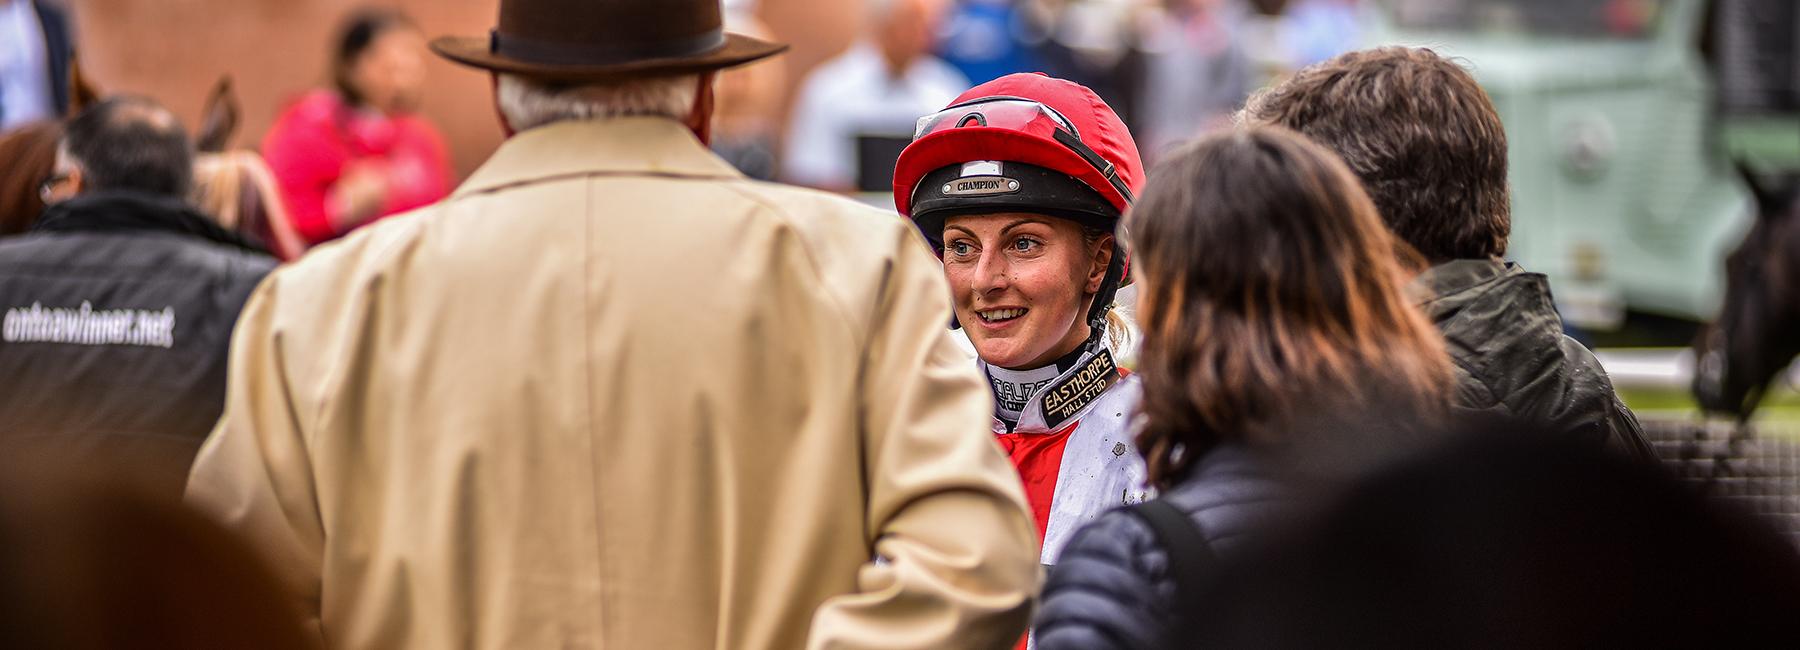 Art-of-Racing-Raceday-P2-Main-Image-1800x650px